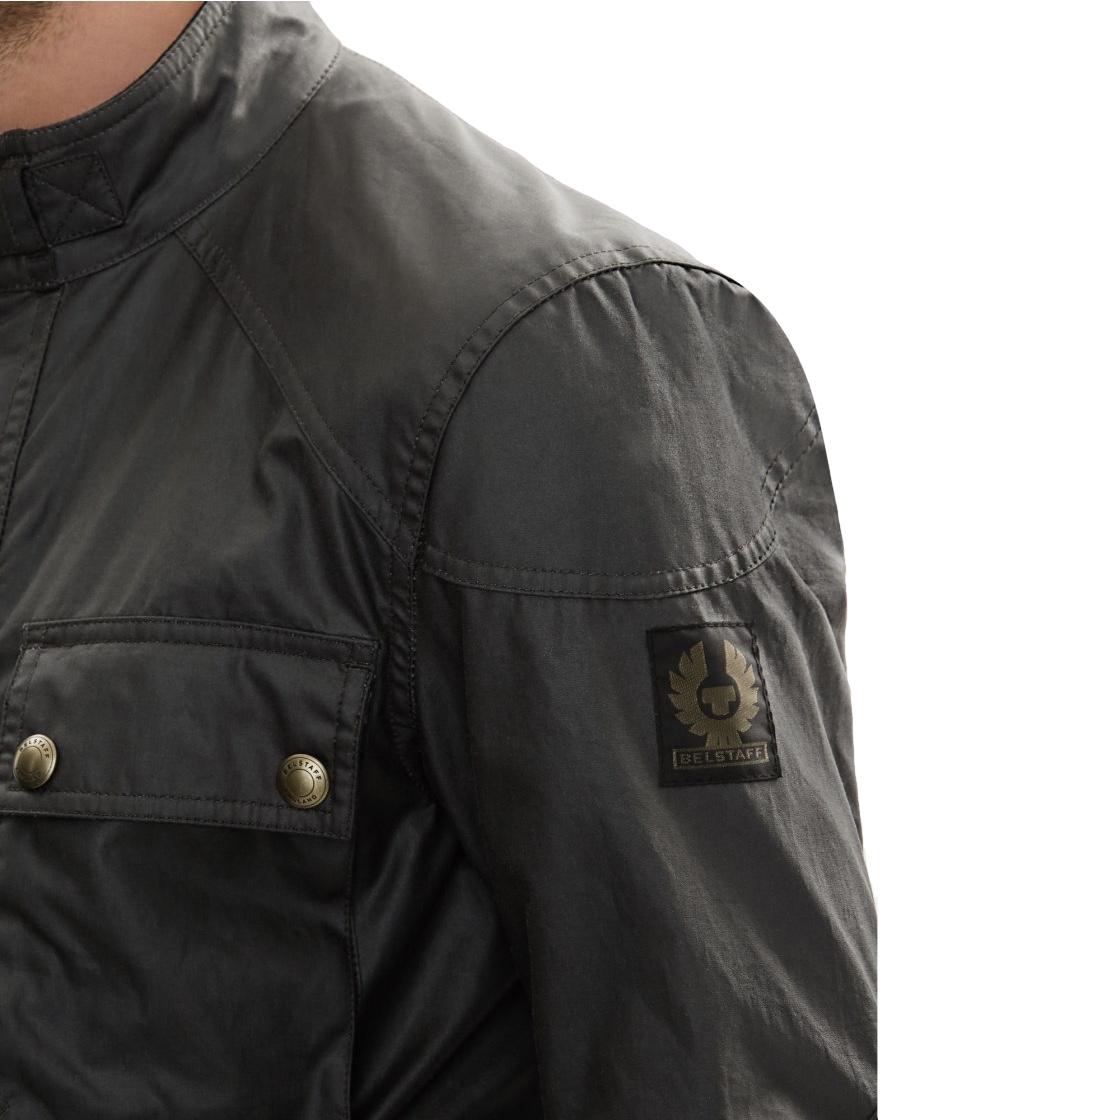 Belstaff The Roadmaster Jacket In Windward Grey Signature 6Oz Waxed Cotton Men 4.jpg